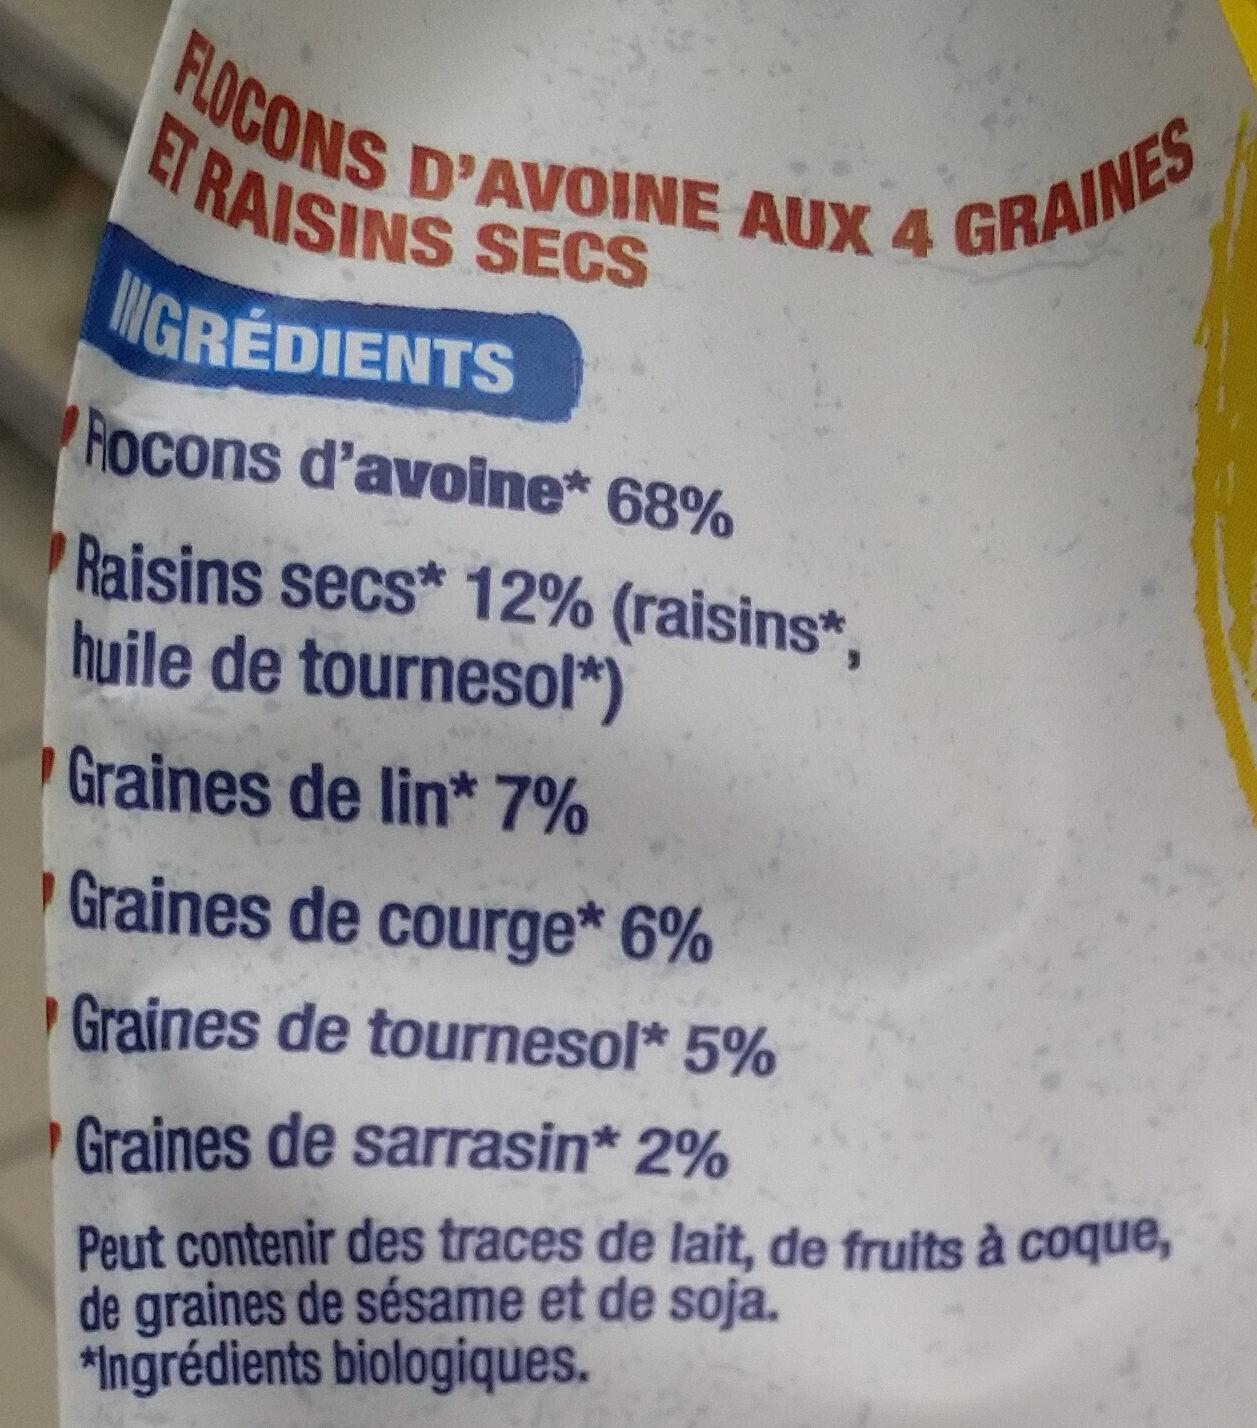 Flocons d'avoine 4 graines et raisins - Ingredientes - fr